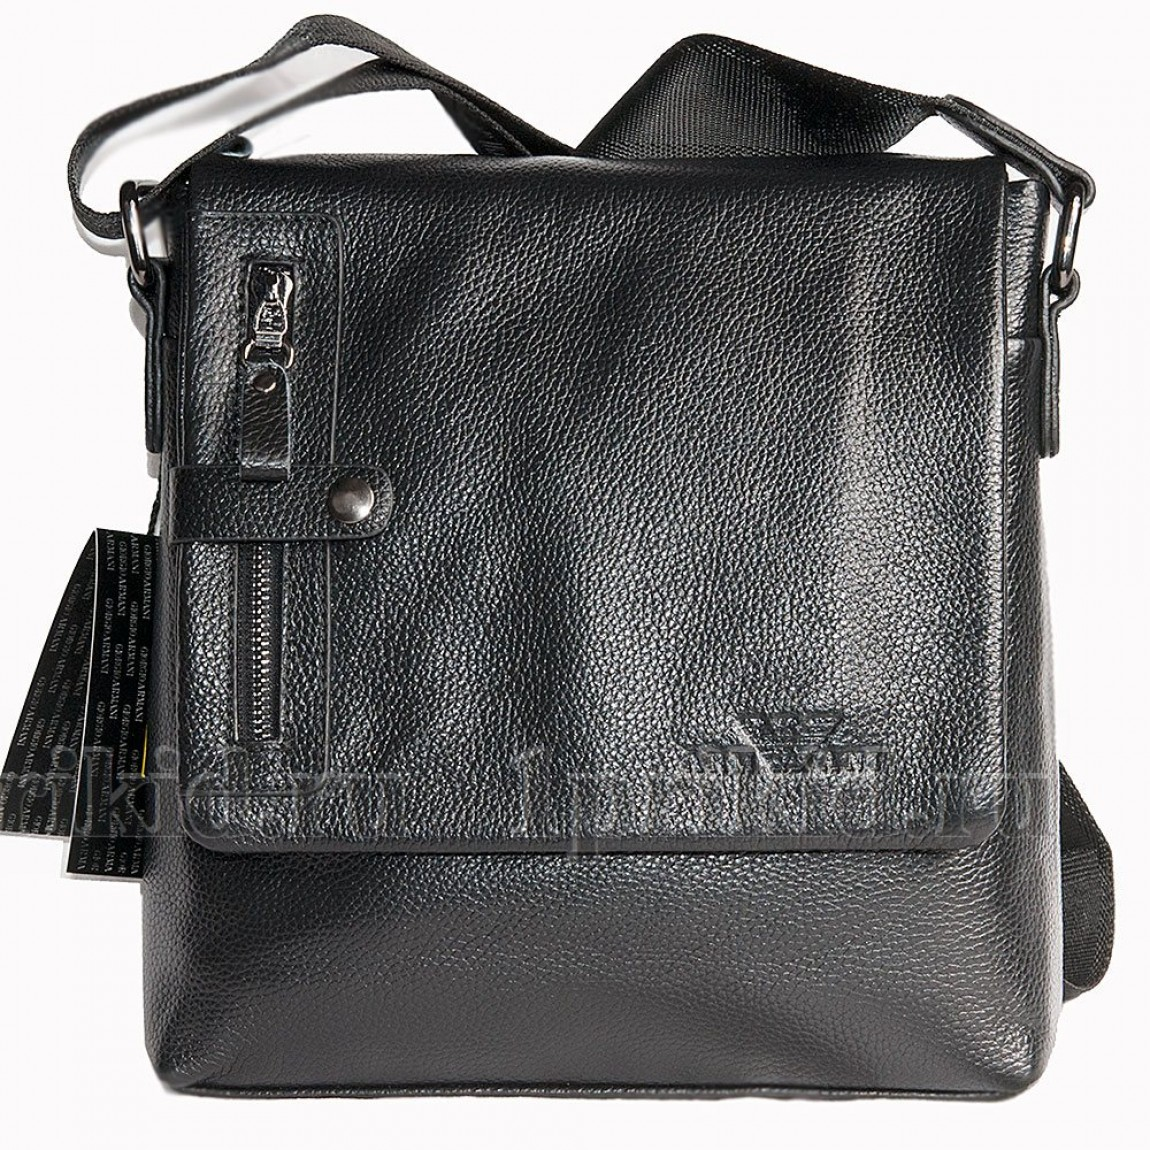 0cb1557bb3a0 ARMANI(Армани) сумка мужская натуральная кожа 24x7x25см/45280 цвет чёрный  ...